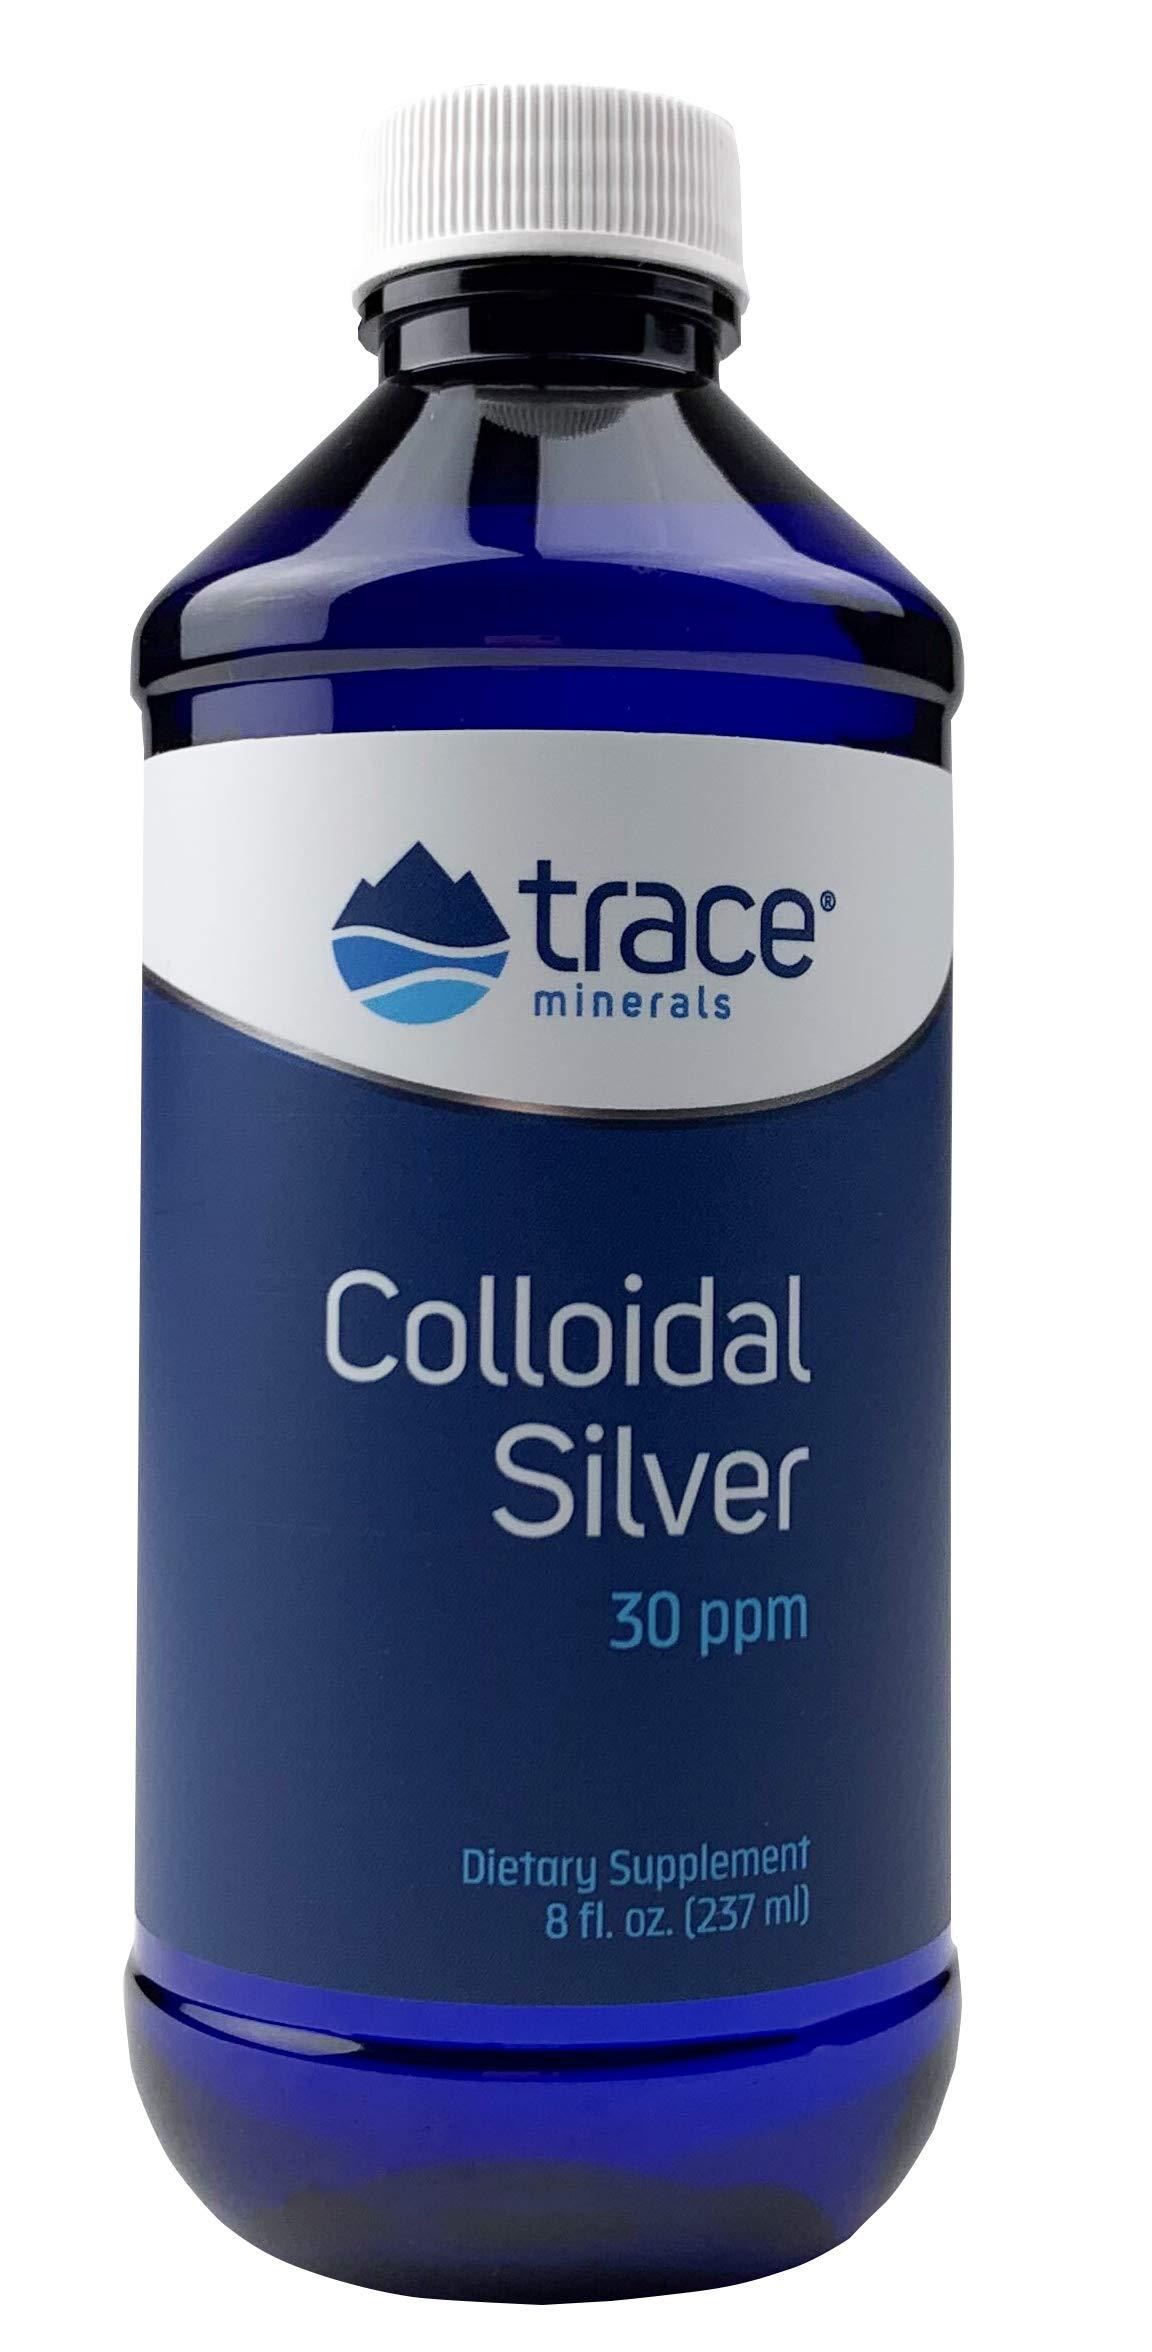 Trace Minerals Research Vegan Colloidal Silver, Bio-Active Silver Hydrosol Liquid Mineral Supplement, Natural & Pure, 30 PPM, 8 fl. Oz